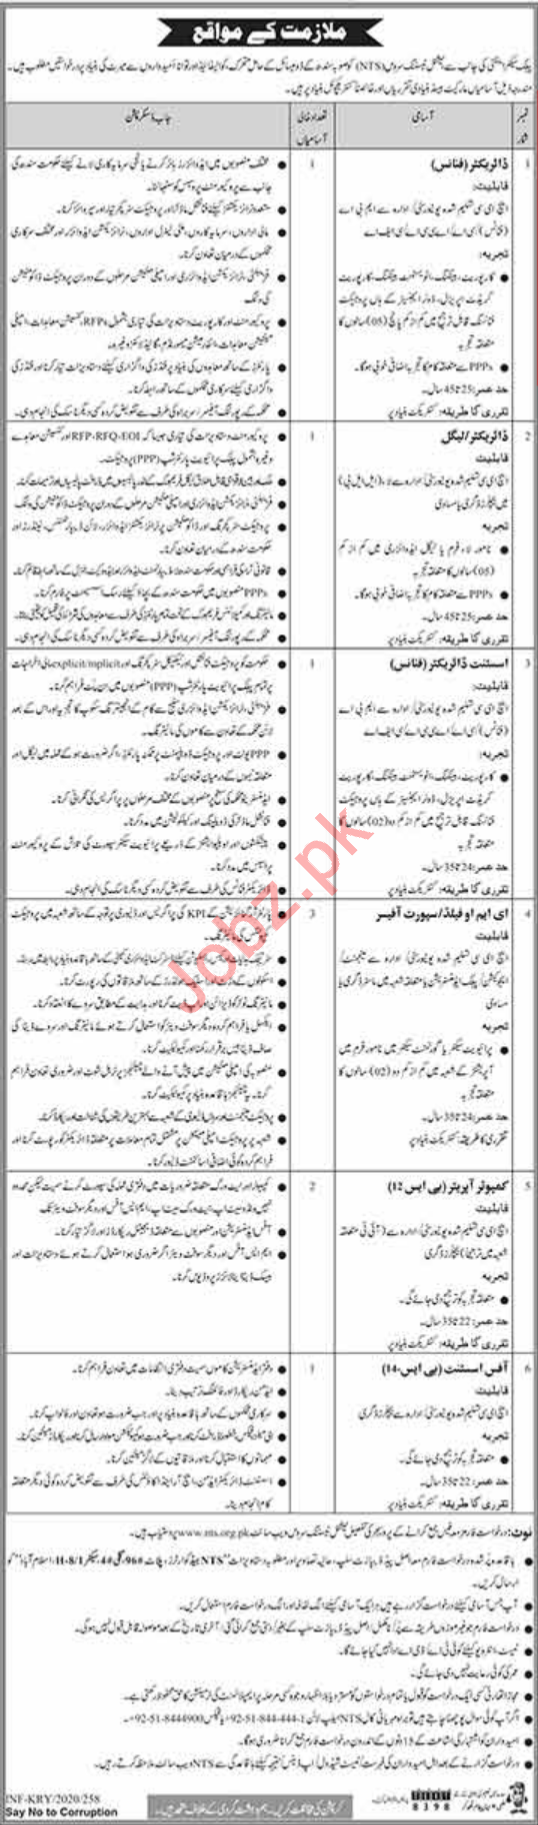 Public Sector Organization Jobs 2020 in Karachi via NTS